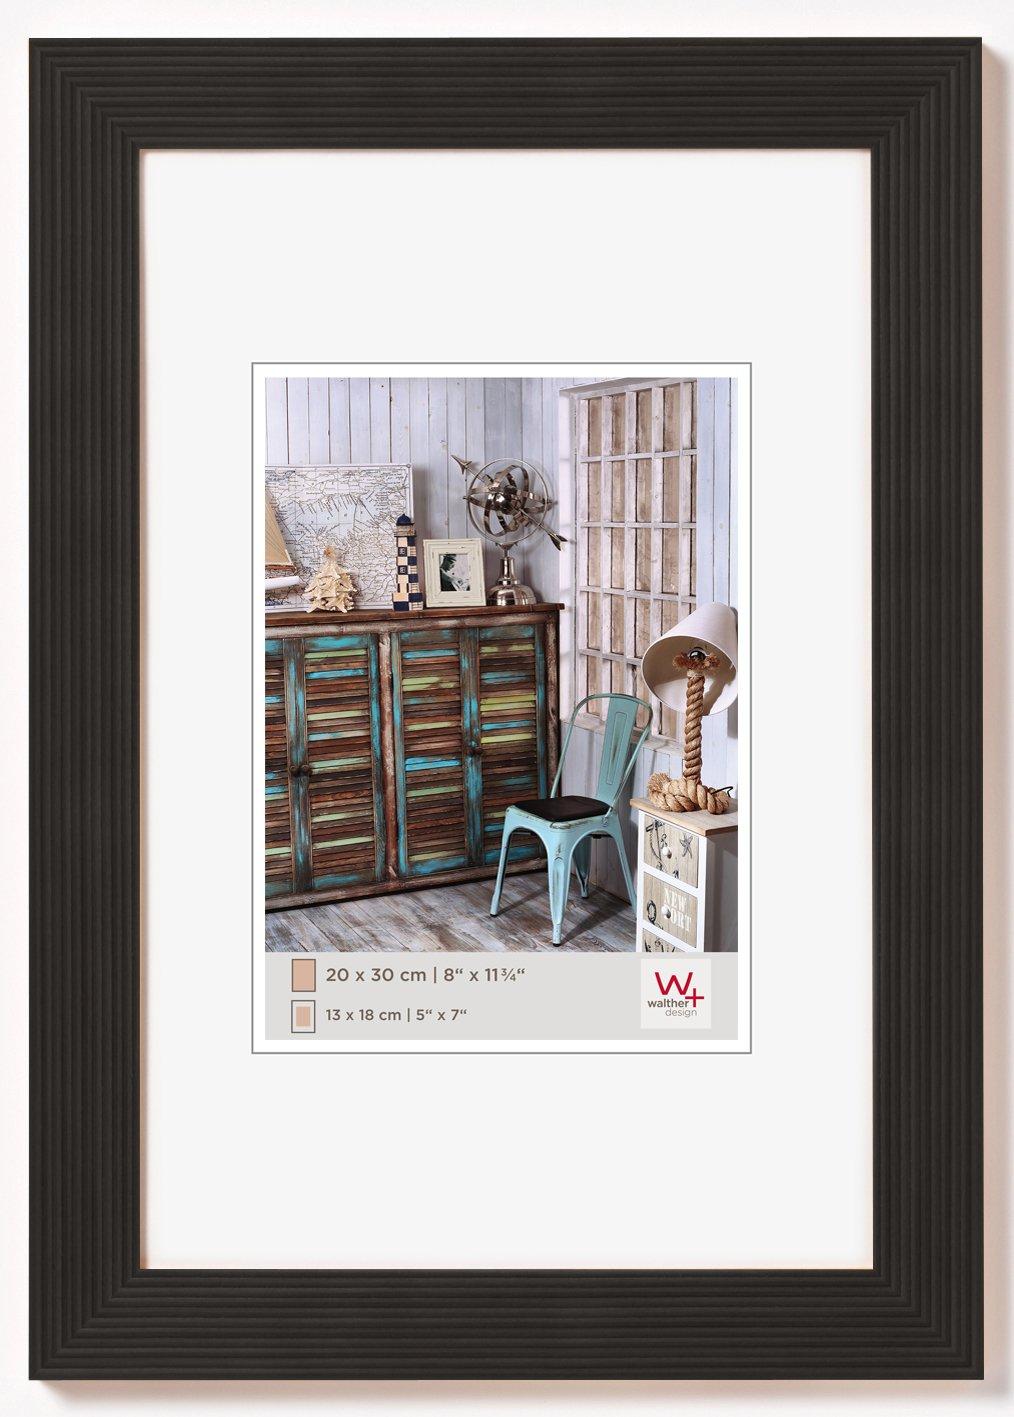 Amazon.de: walther HI040B Grado Holzrahmen Format 30 x 40 cm, schwarz